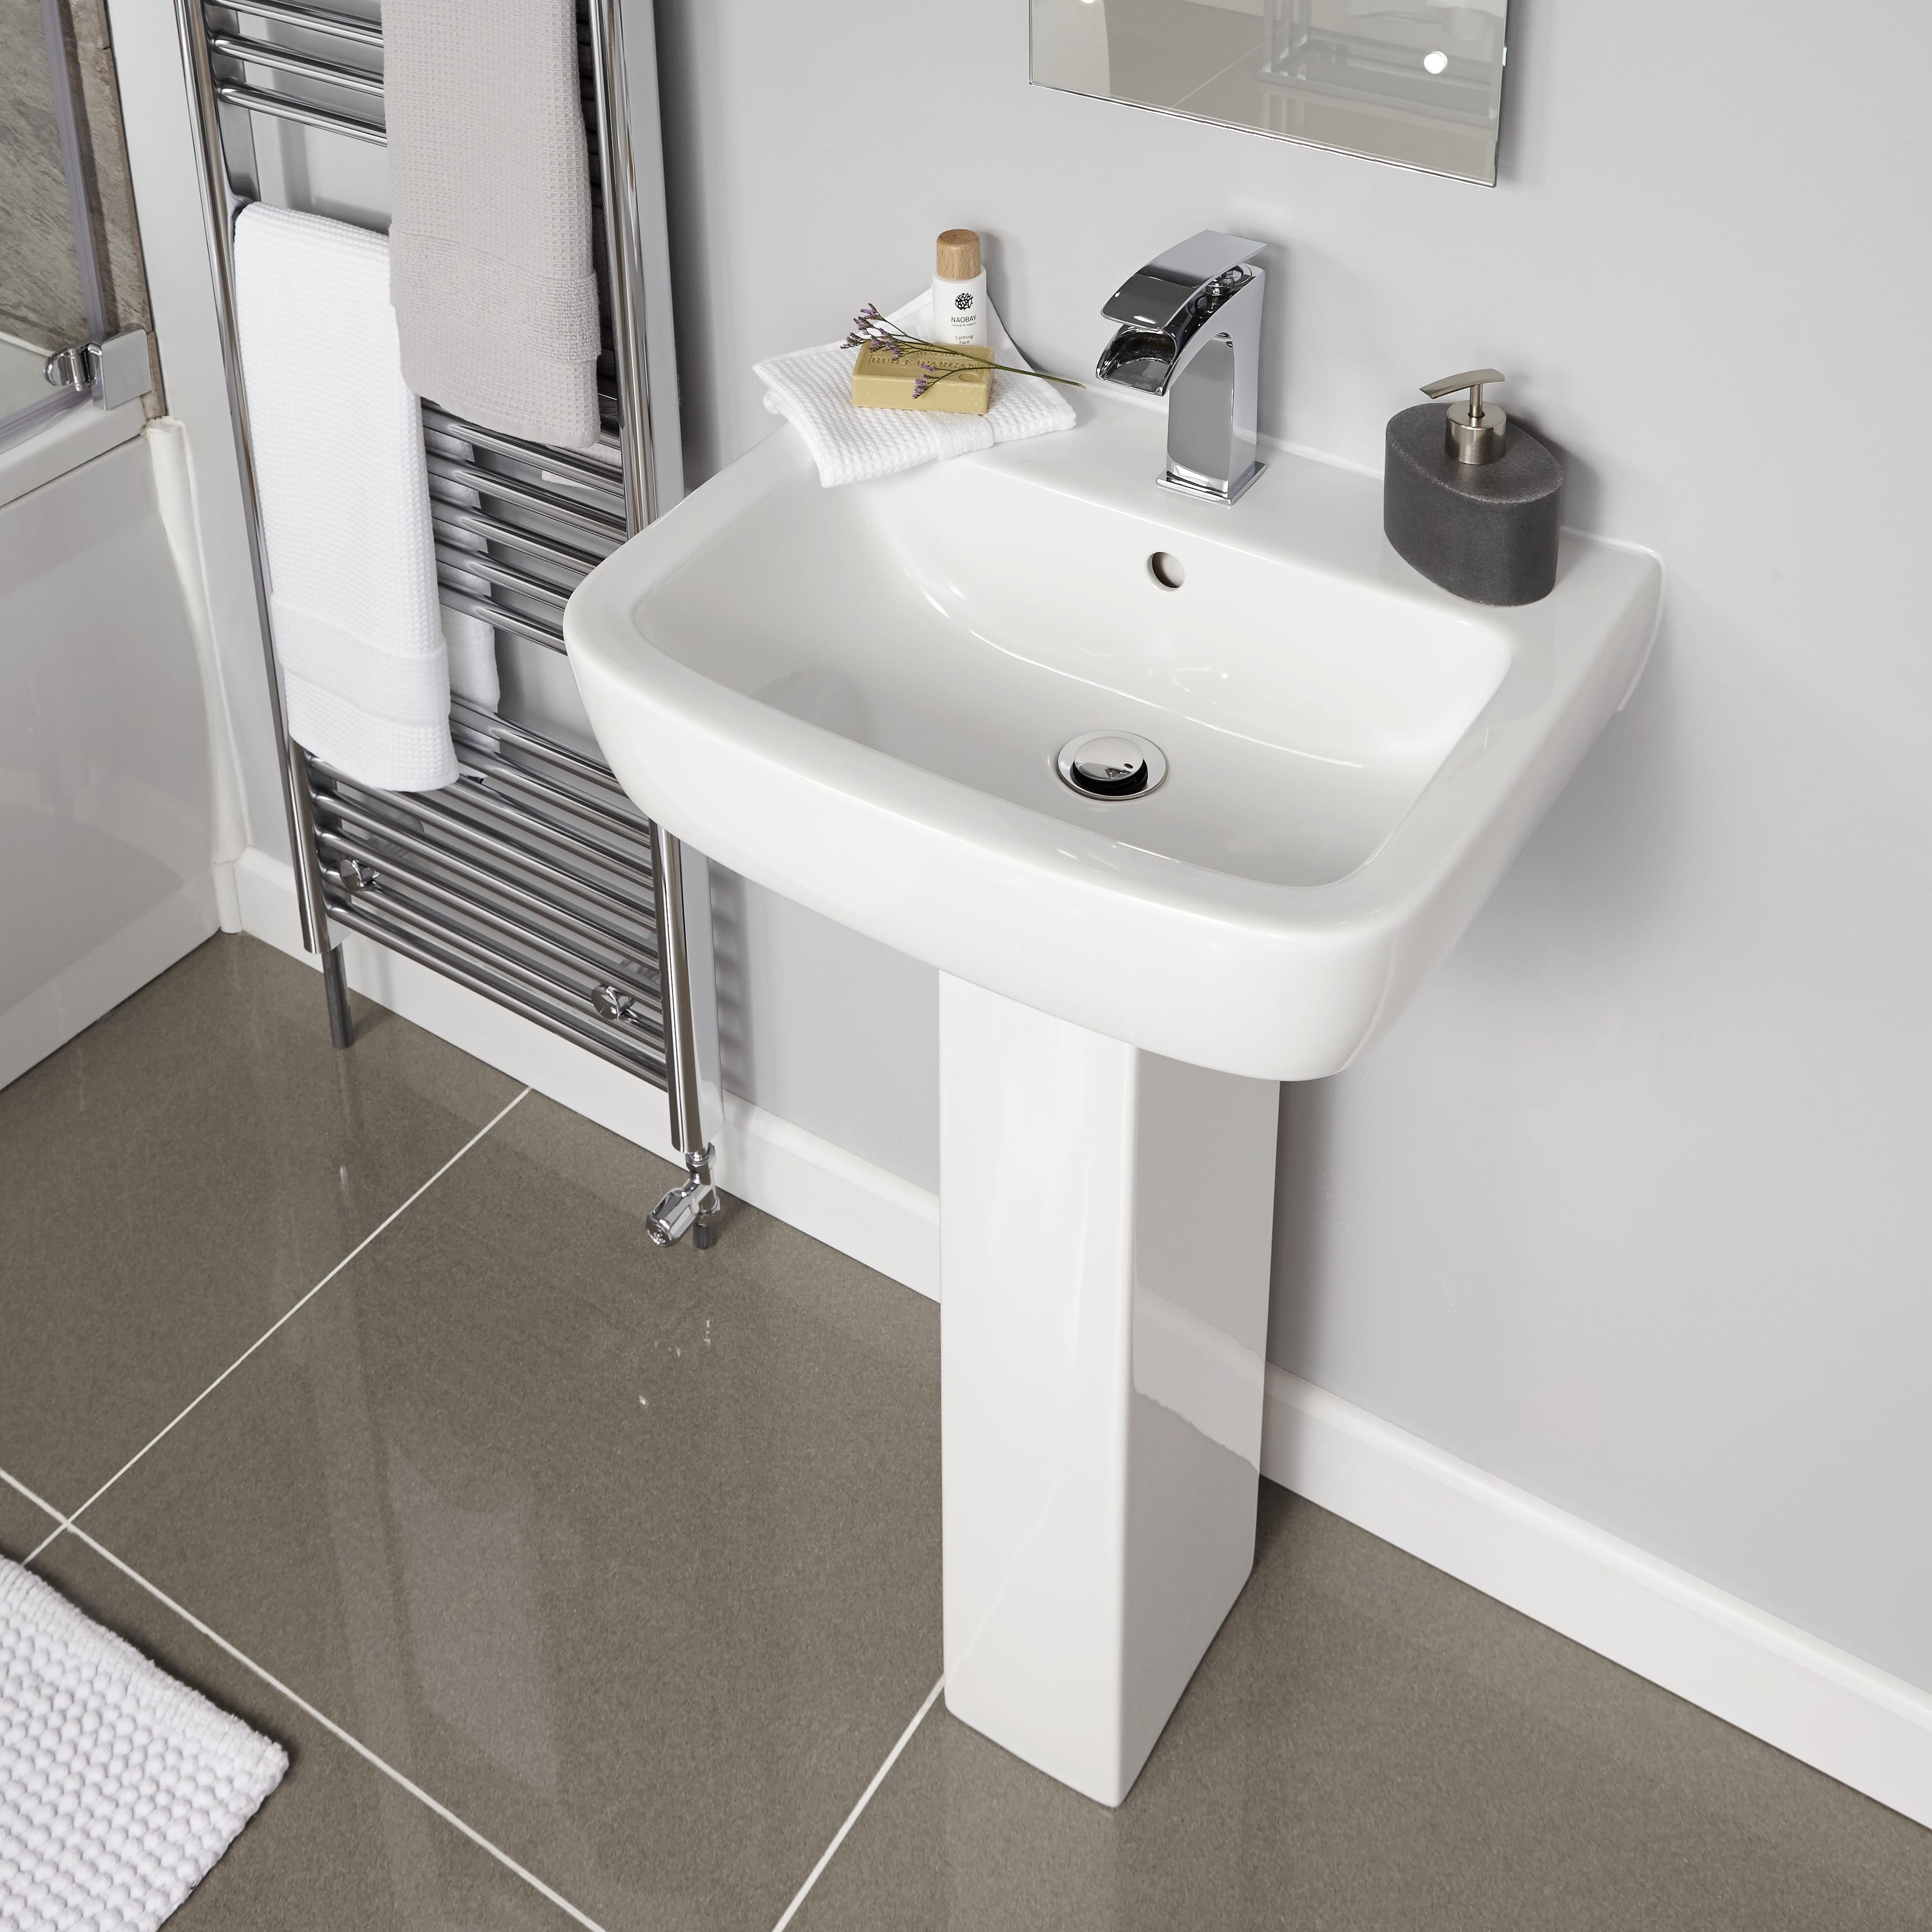 Bathrooms Bathroom Fittings Accessories Diy At B Q